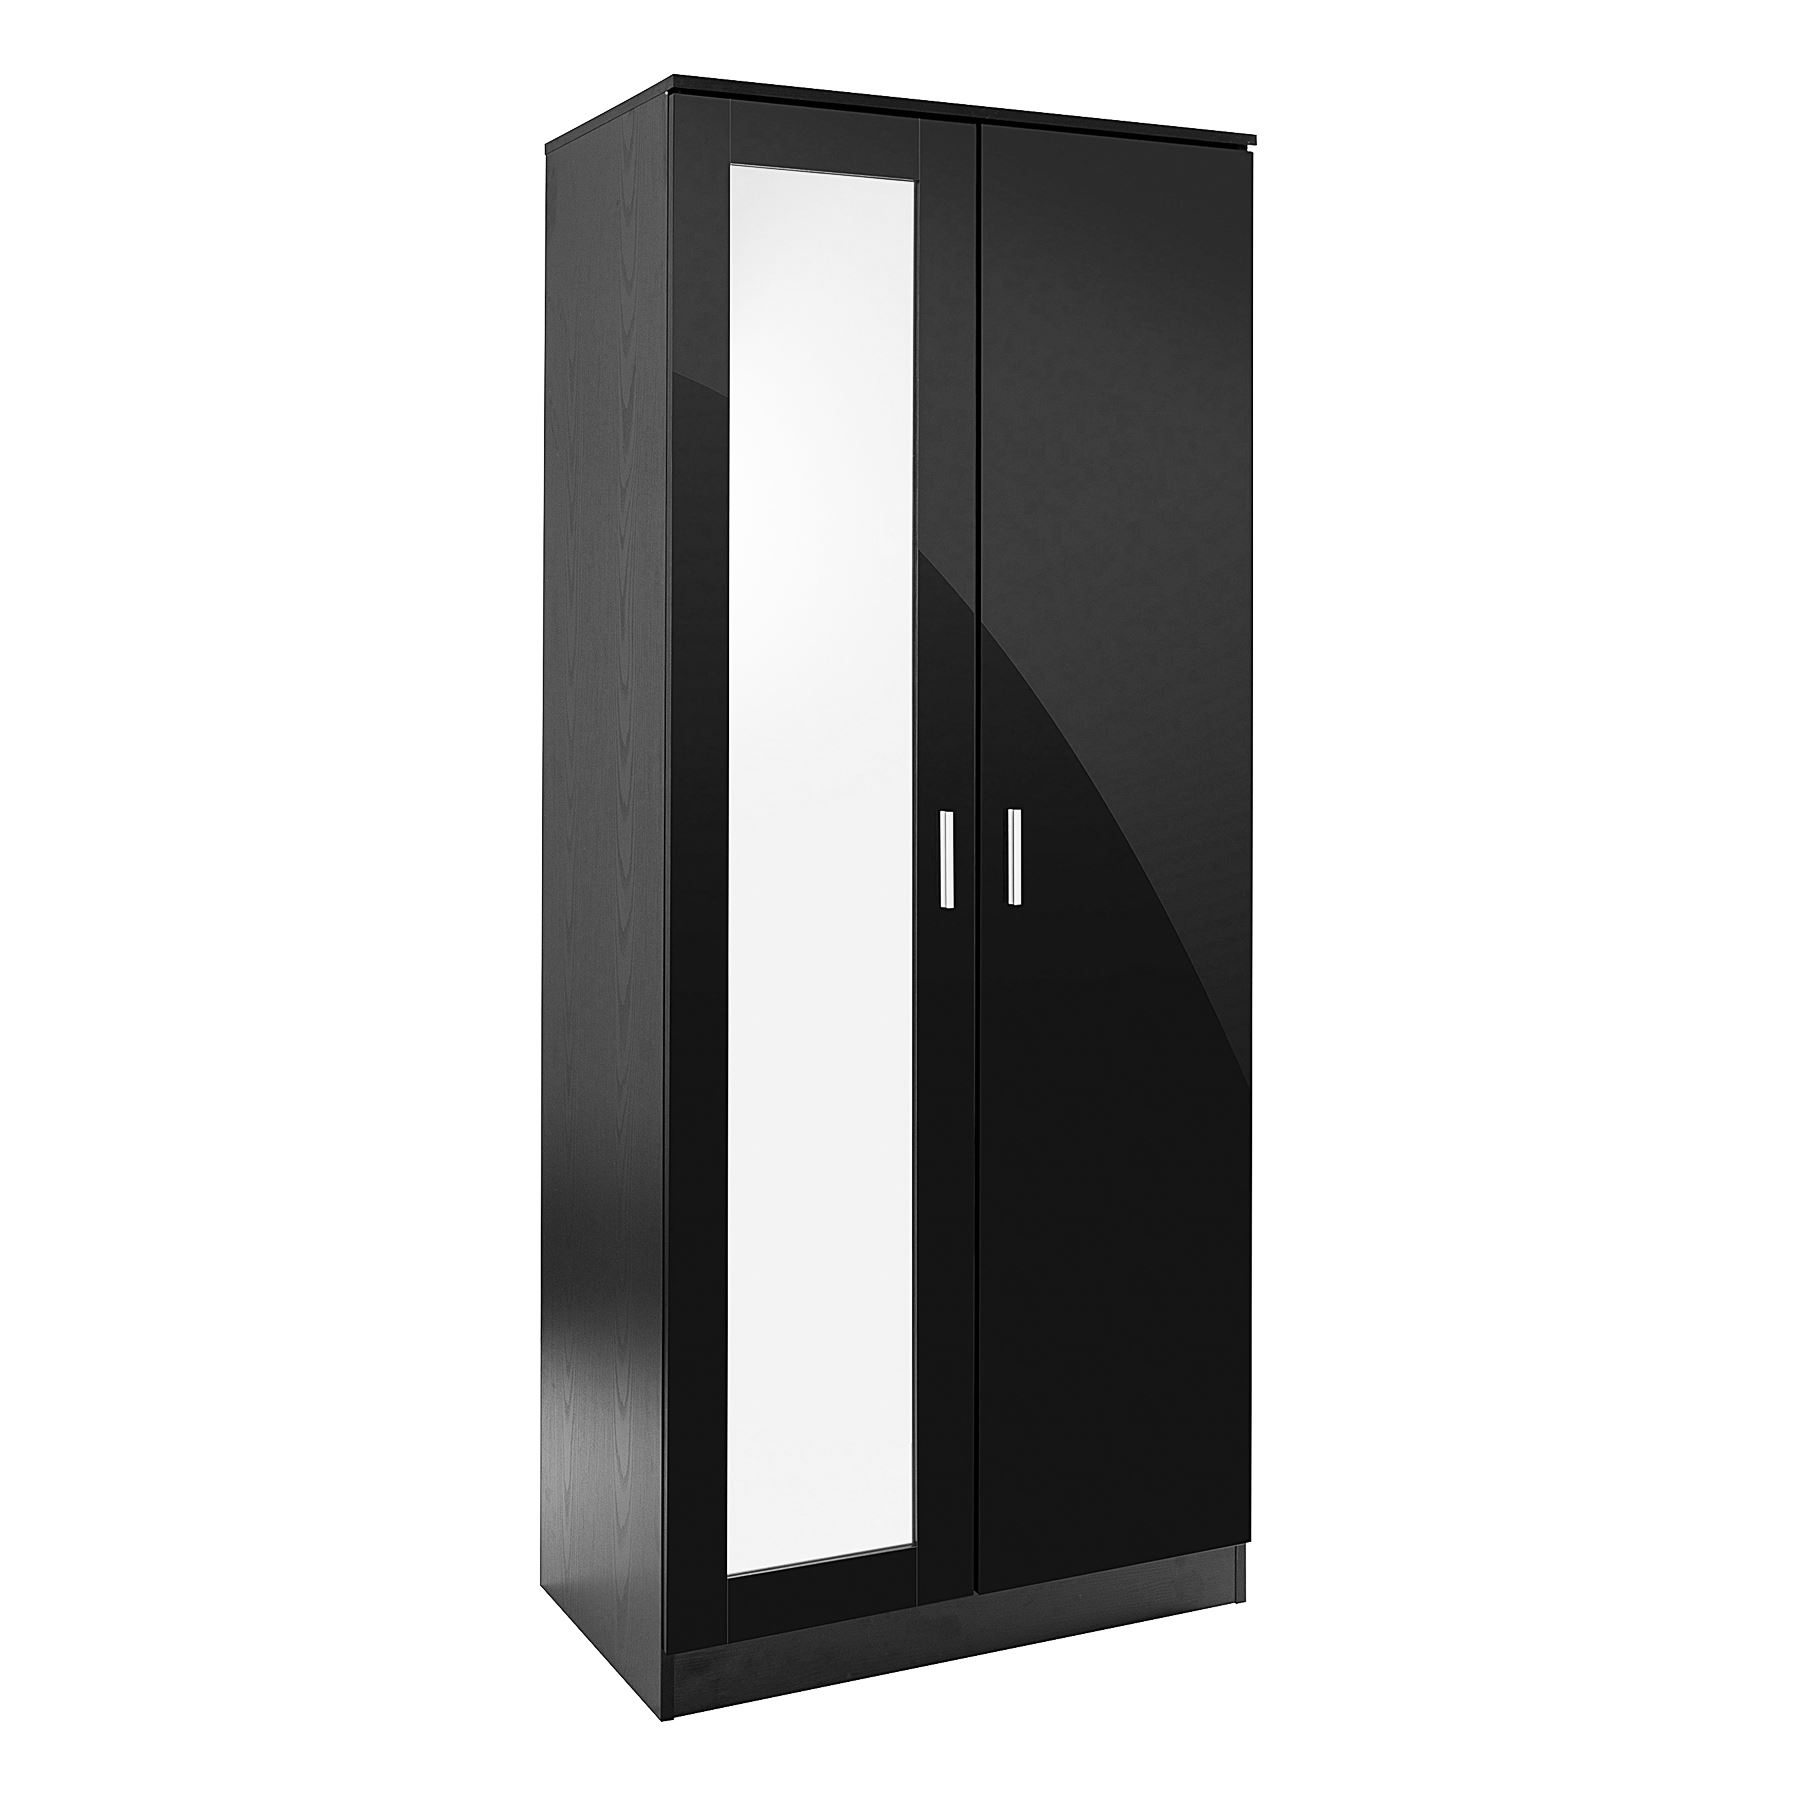 Popular Black Gloss Mirror Wardrobes Intended For Bedroom Furniture 3 Piece Set Black Gloss Wardrobe Drawer Bedside (View 12 of 15)